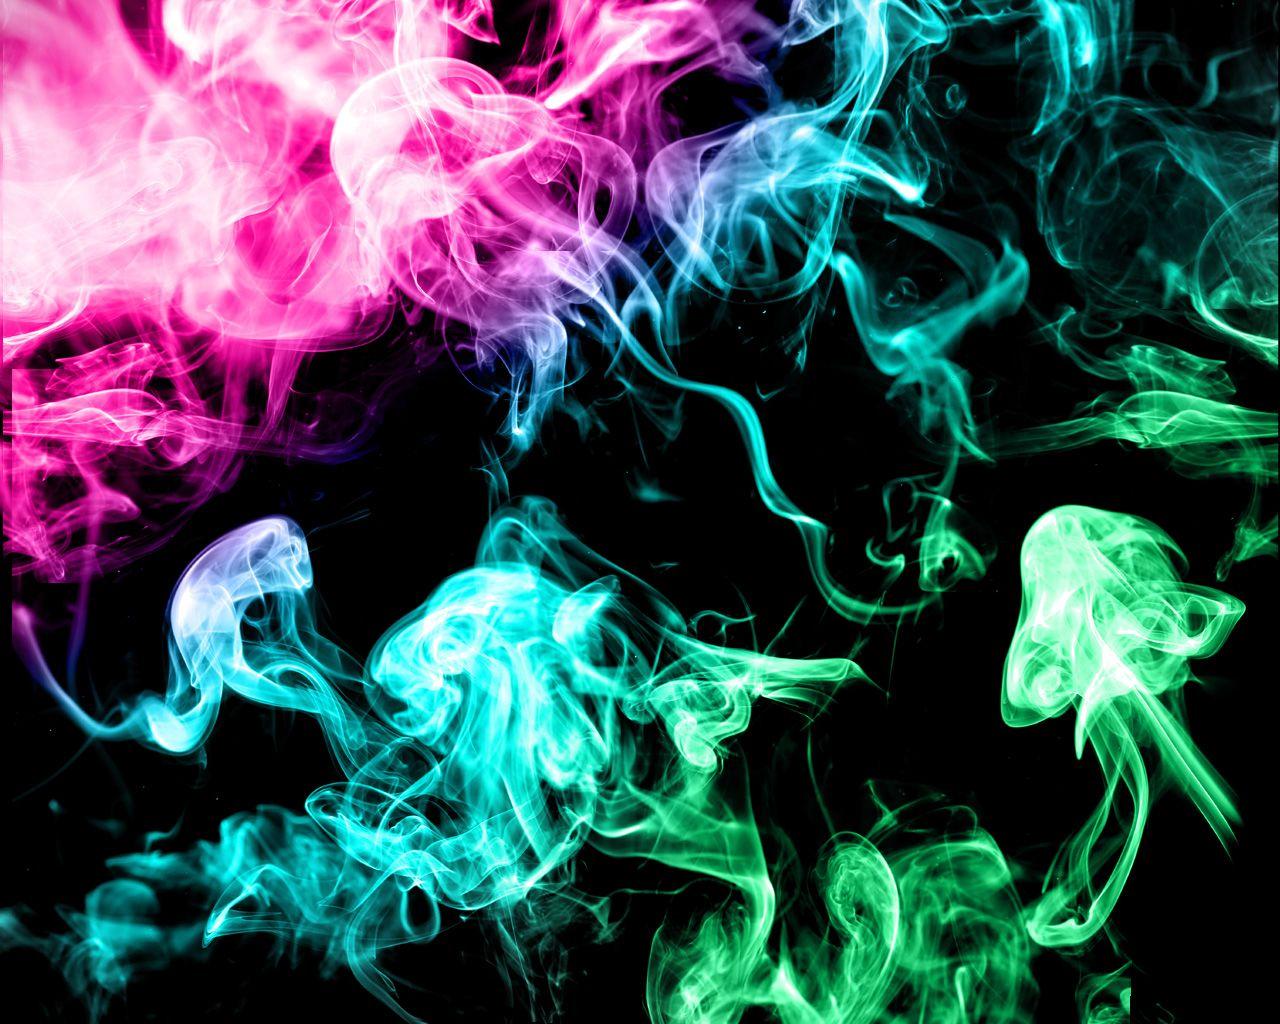 Sensuous Colored Smoke Photography HD Wallpaper Wallpaper